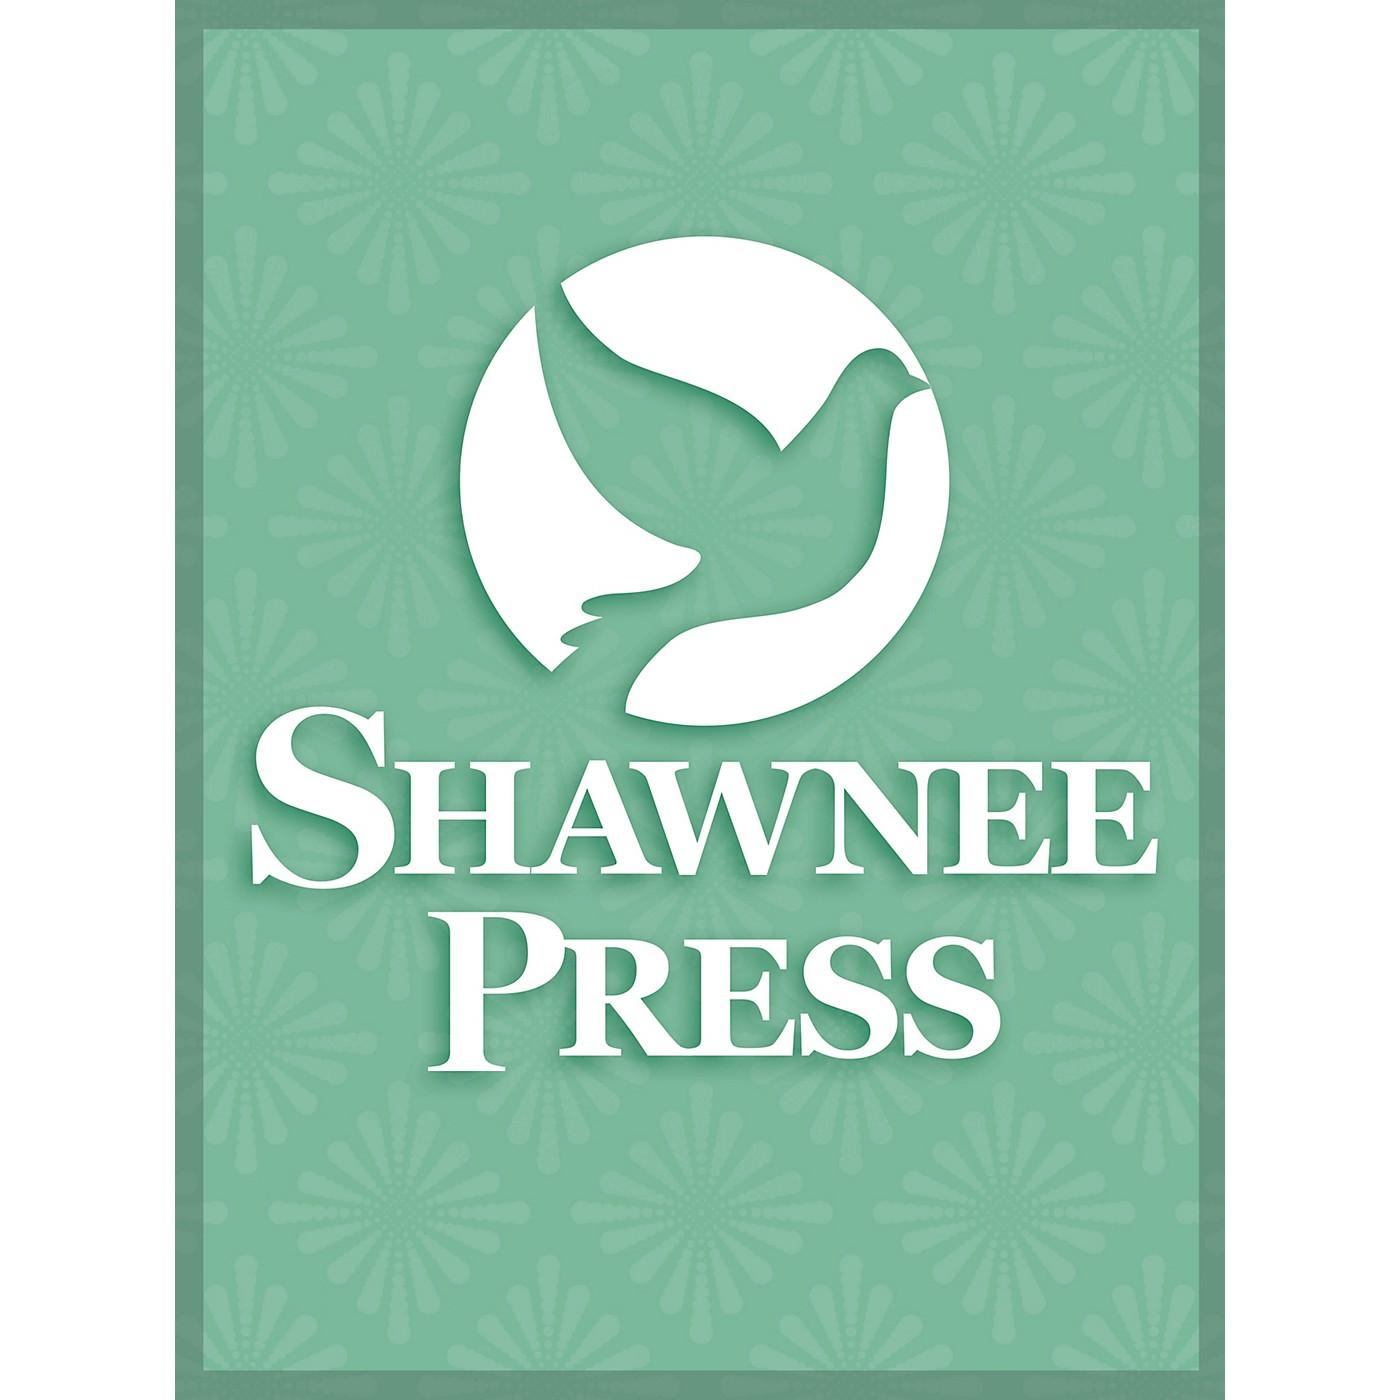 Shawnee Press Three Pieces for Flute (Flute Solo) Shawnee Press Series thumbnail